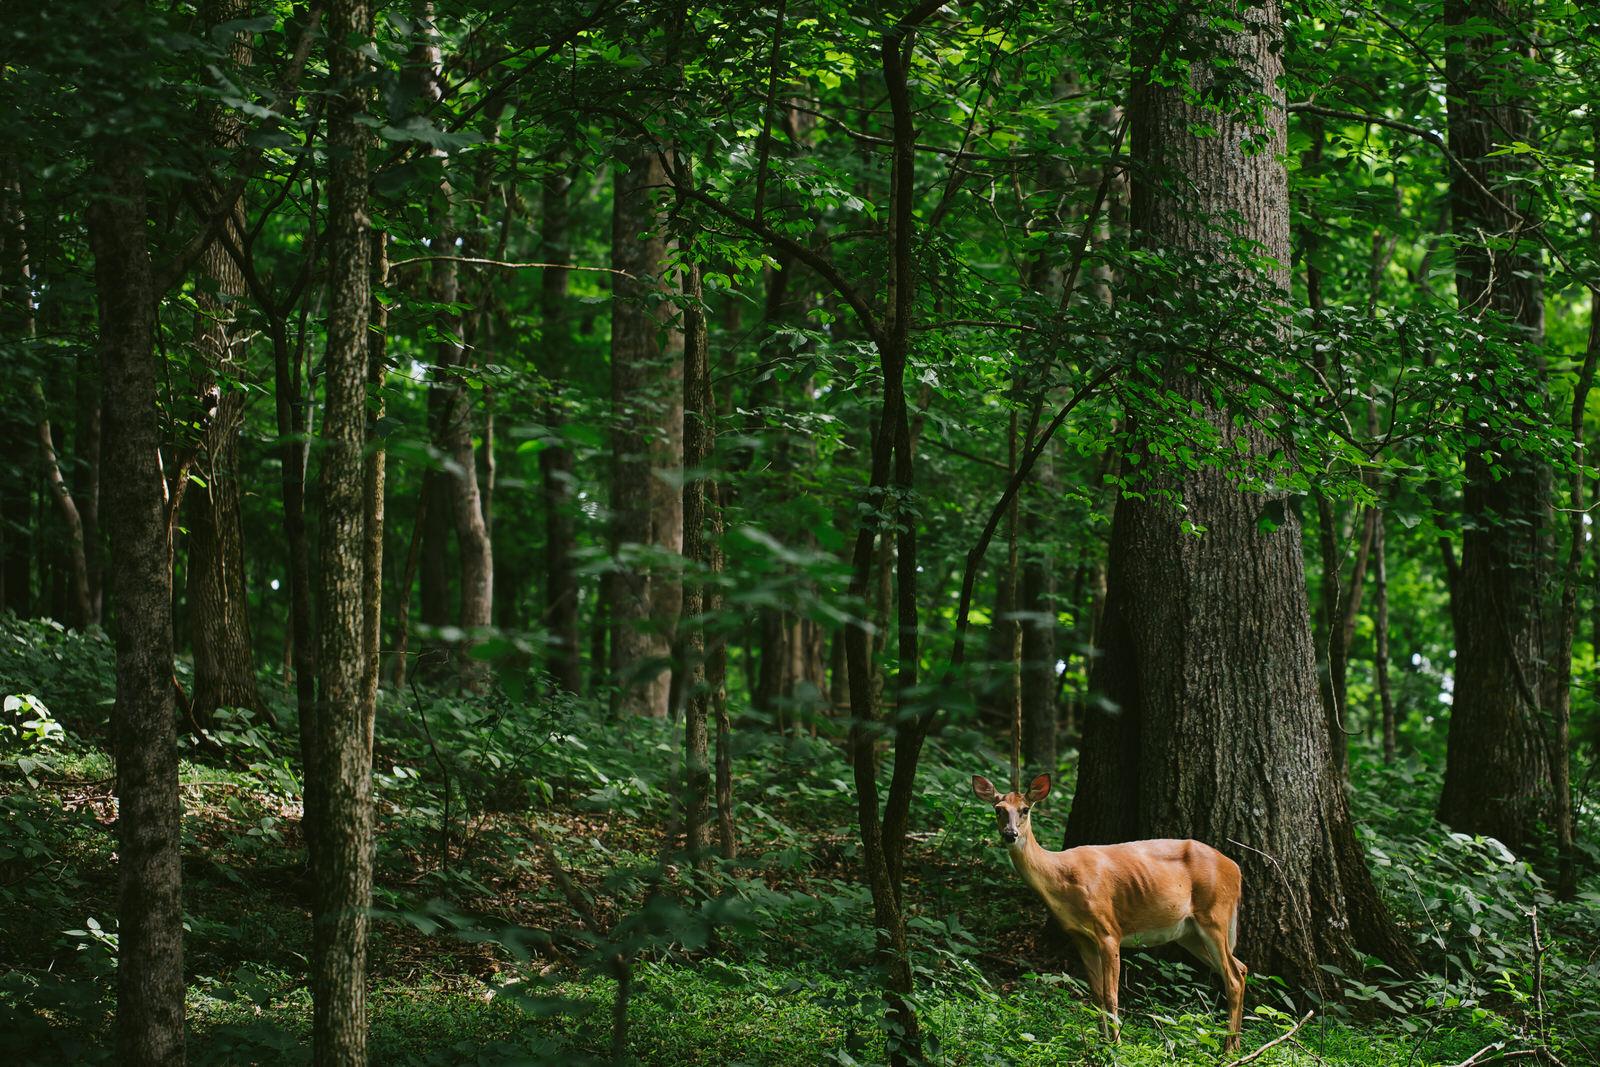 deer-hiking-tiny-house-photo-travel-tennessee.jpg